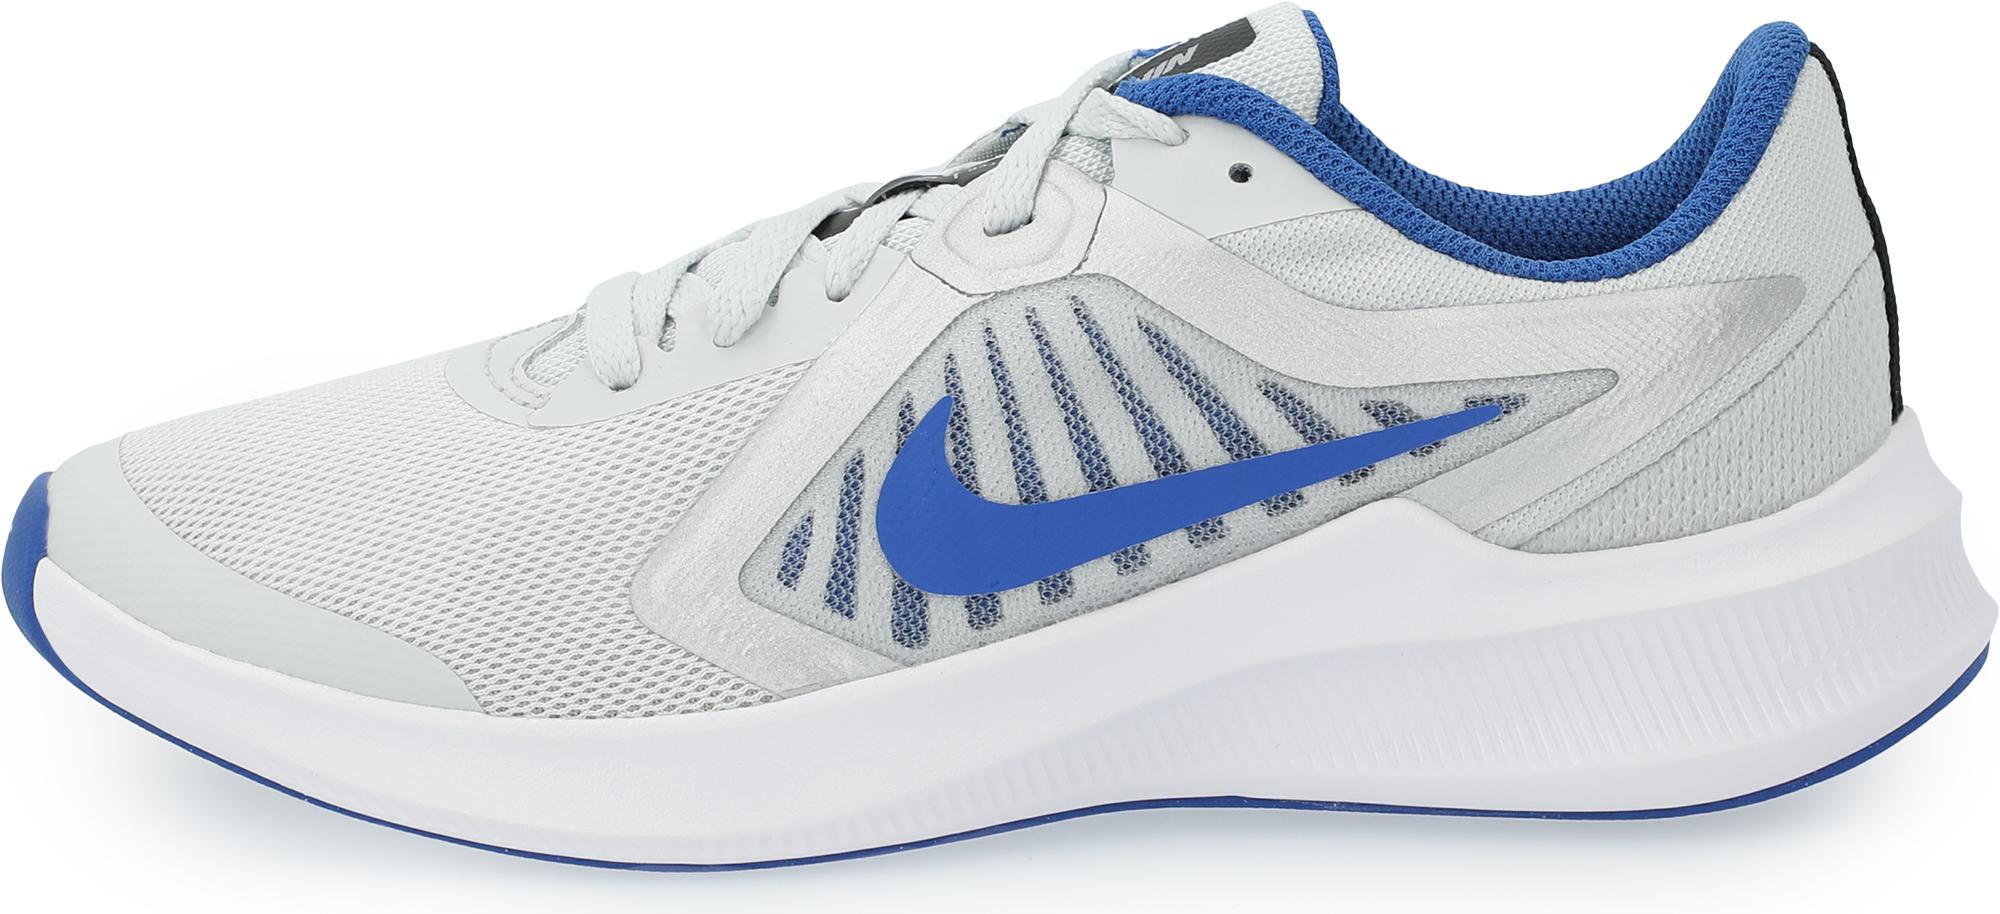 Nike Кроссовки для мальчиков Nike Downshifter 10 (GS), размер 34.5 кроссовки nike cortez basic ltr se gs shoe girls aa3043 001